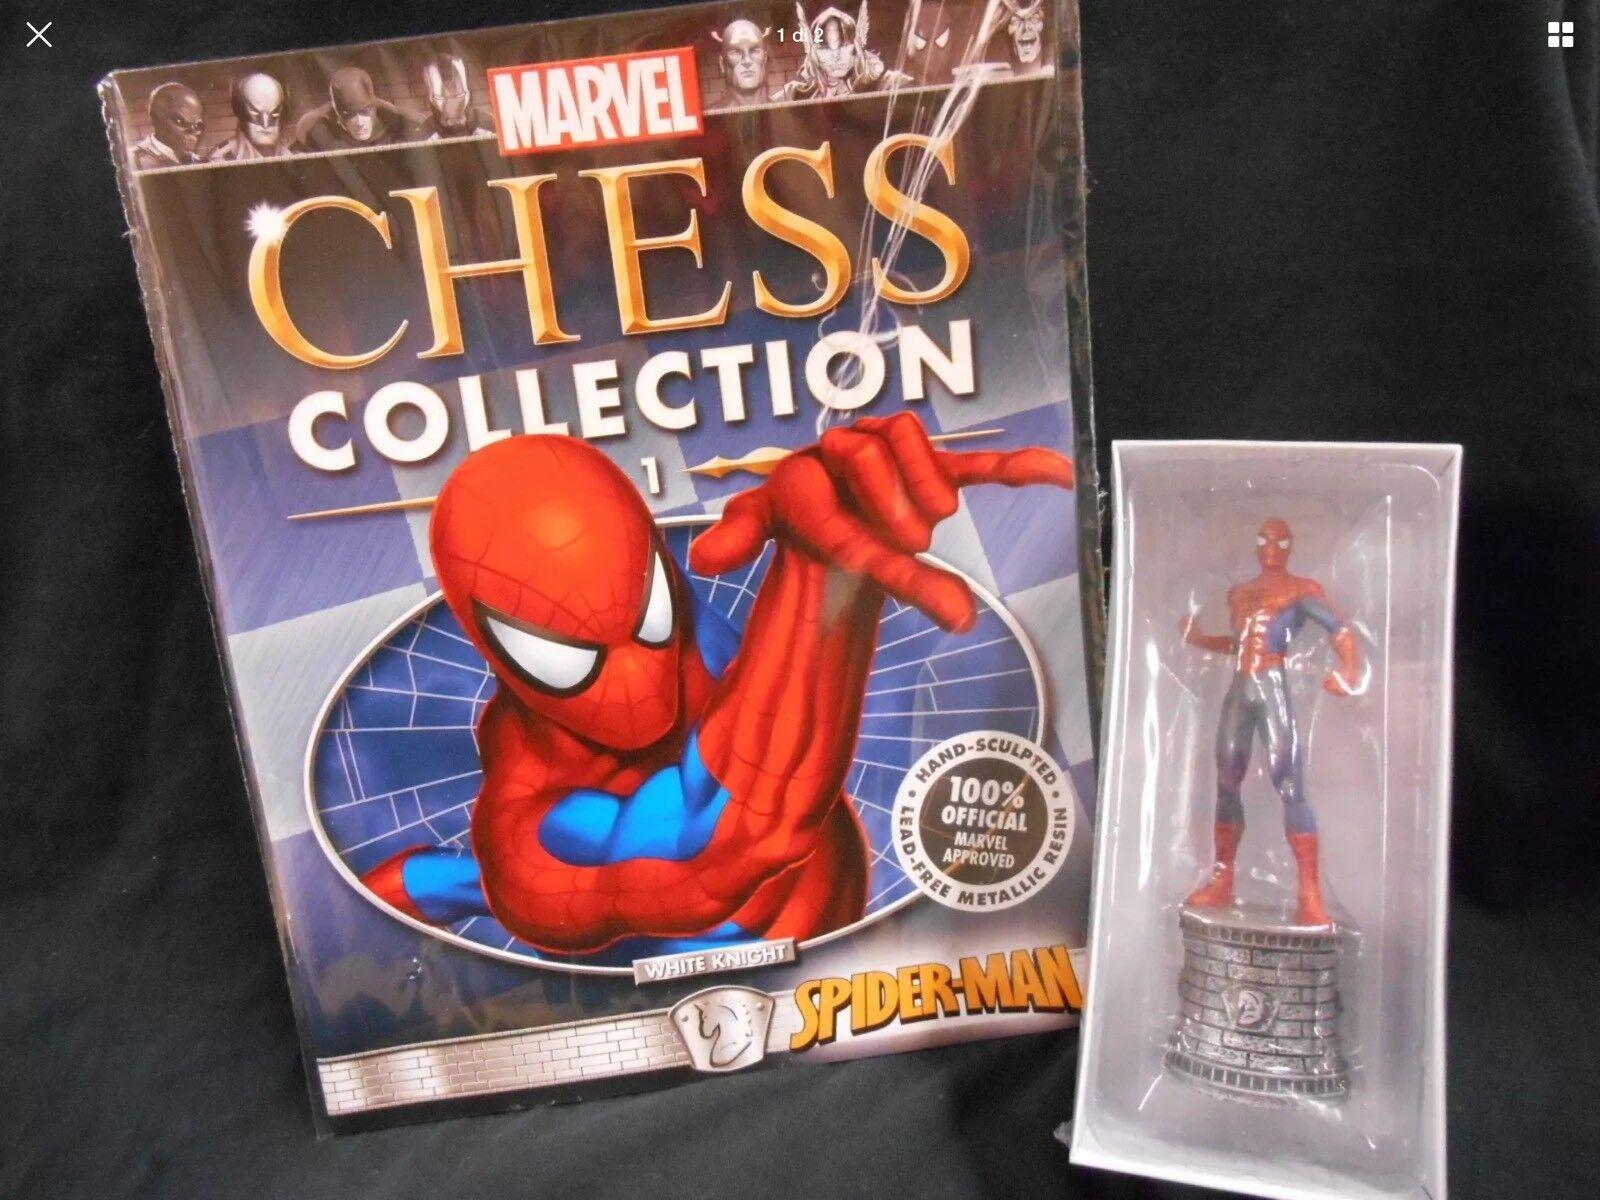 Marvel Chess Collection Eaglemoss 1 96  specialeeei 1 5 Subset Fantastici Quattro  miglior reputazione